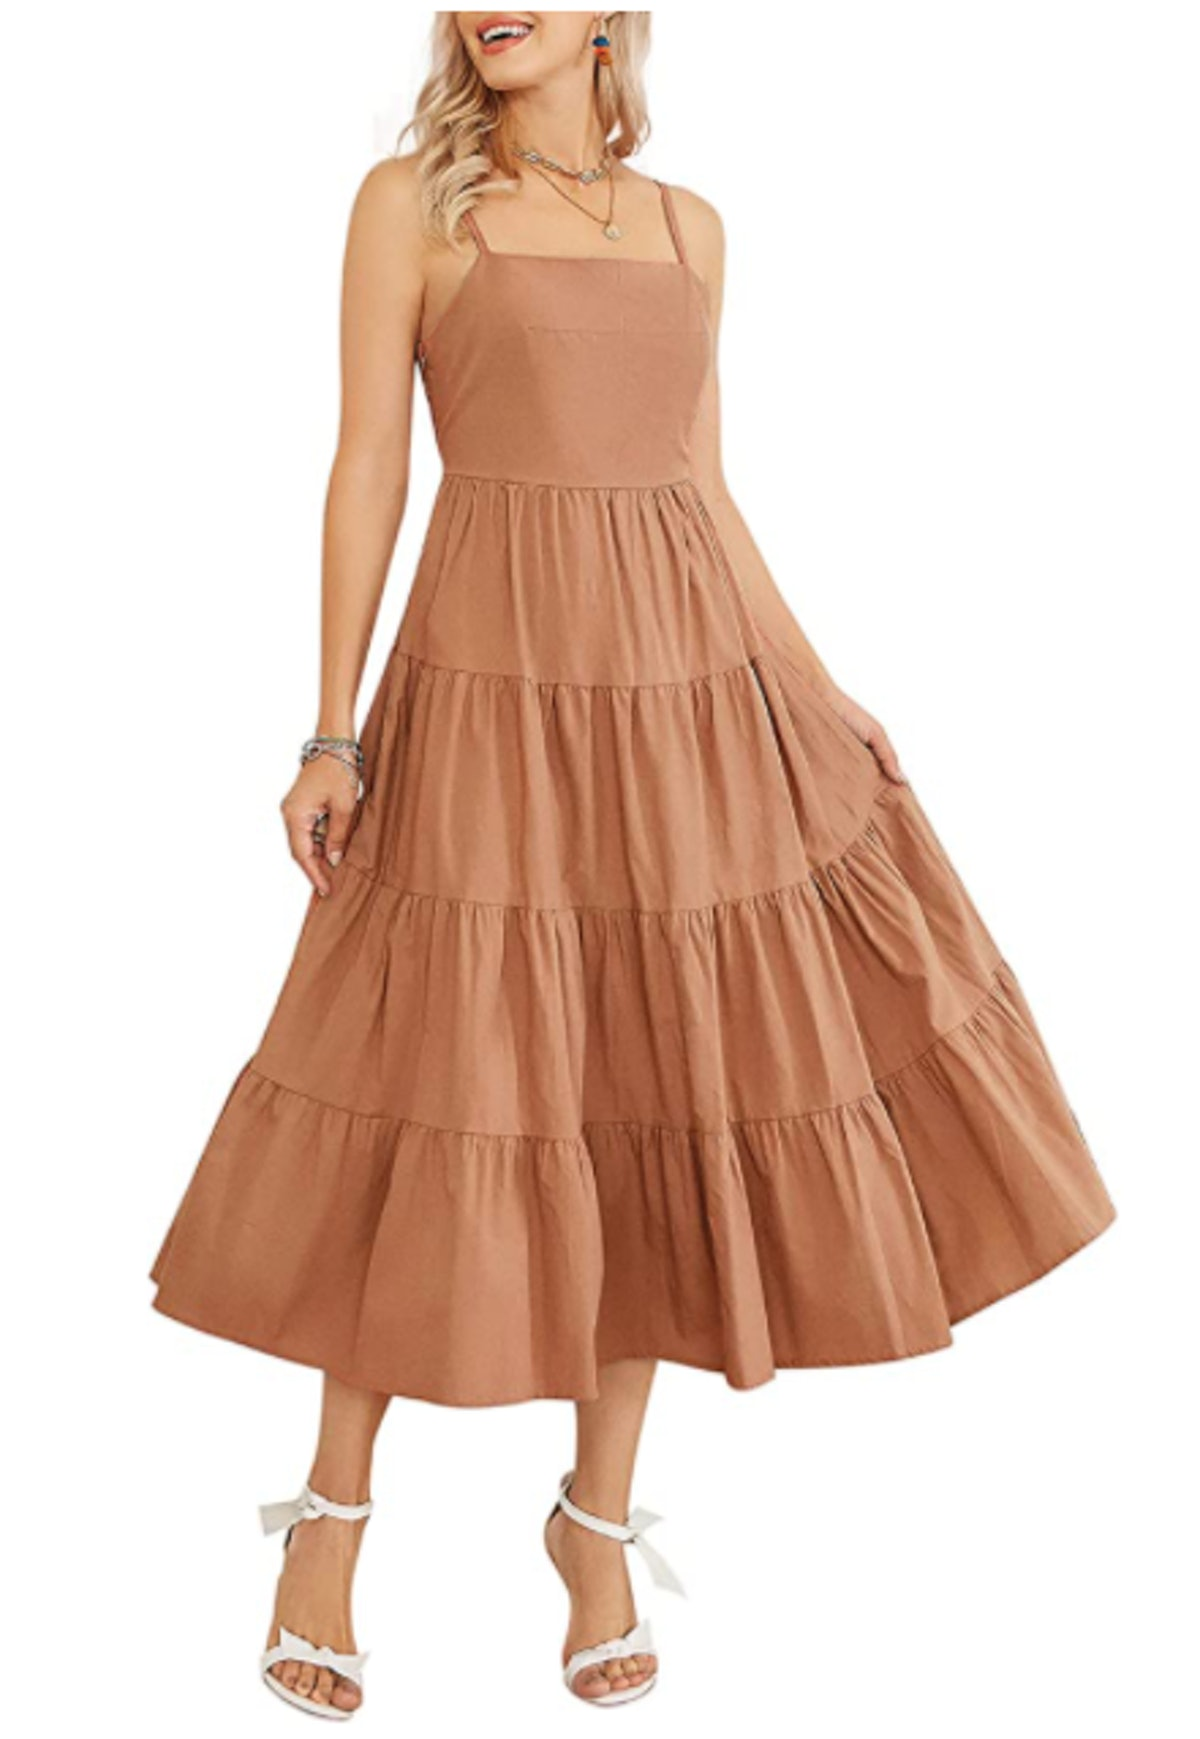 Fashionme Tiered Maxi Dress